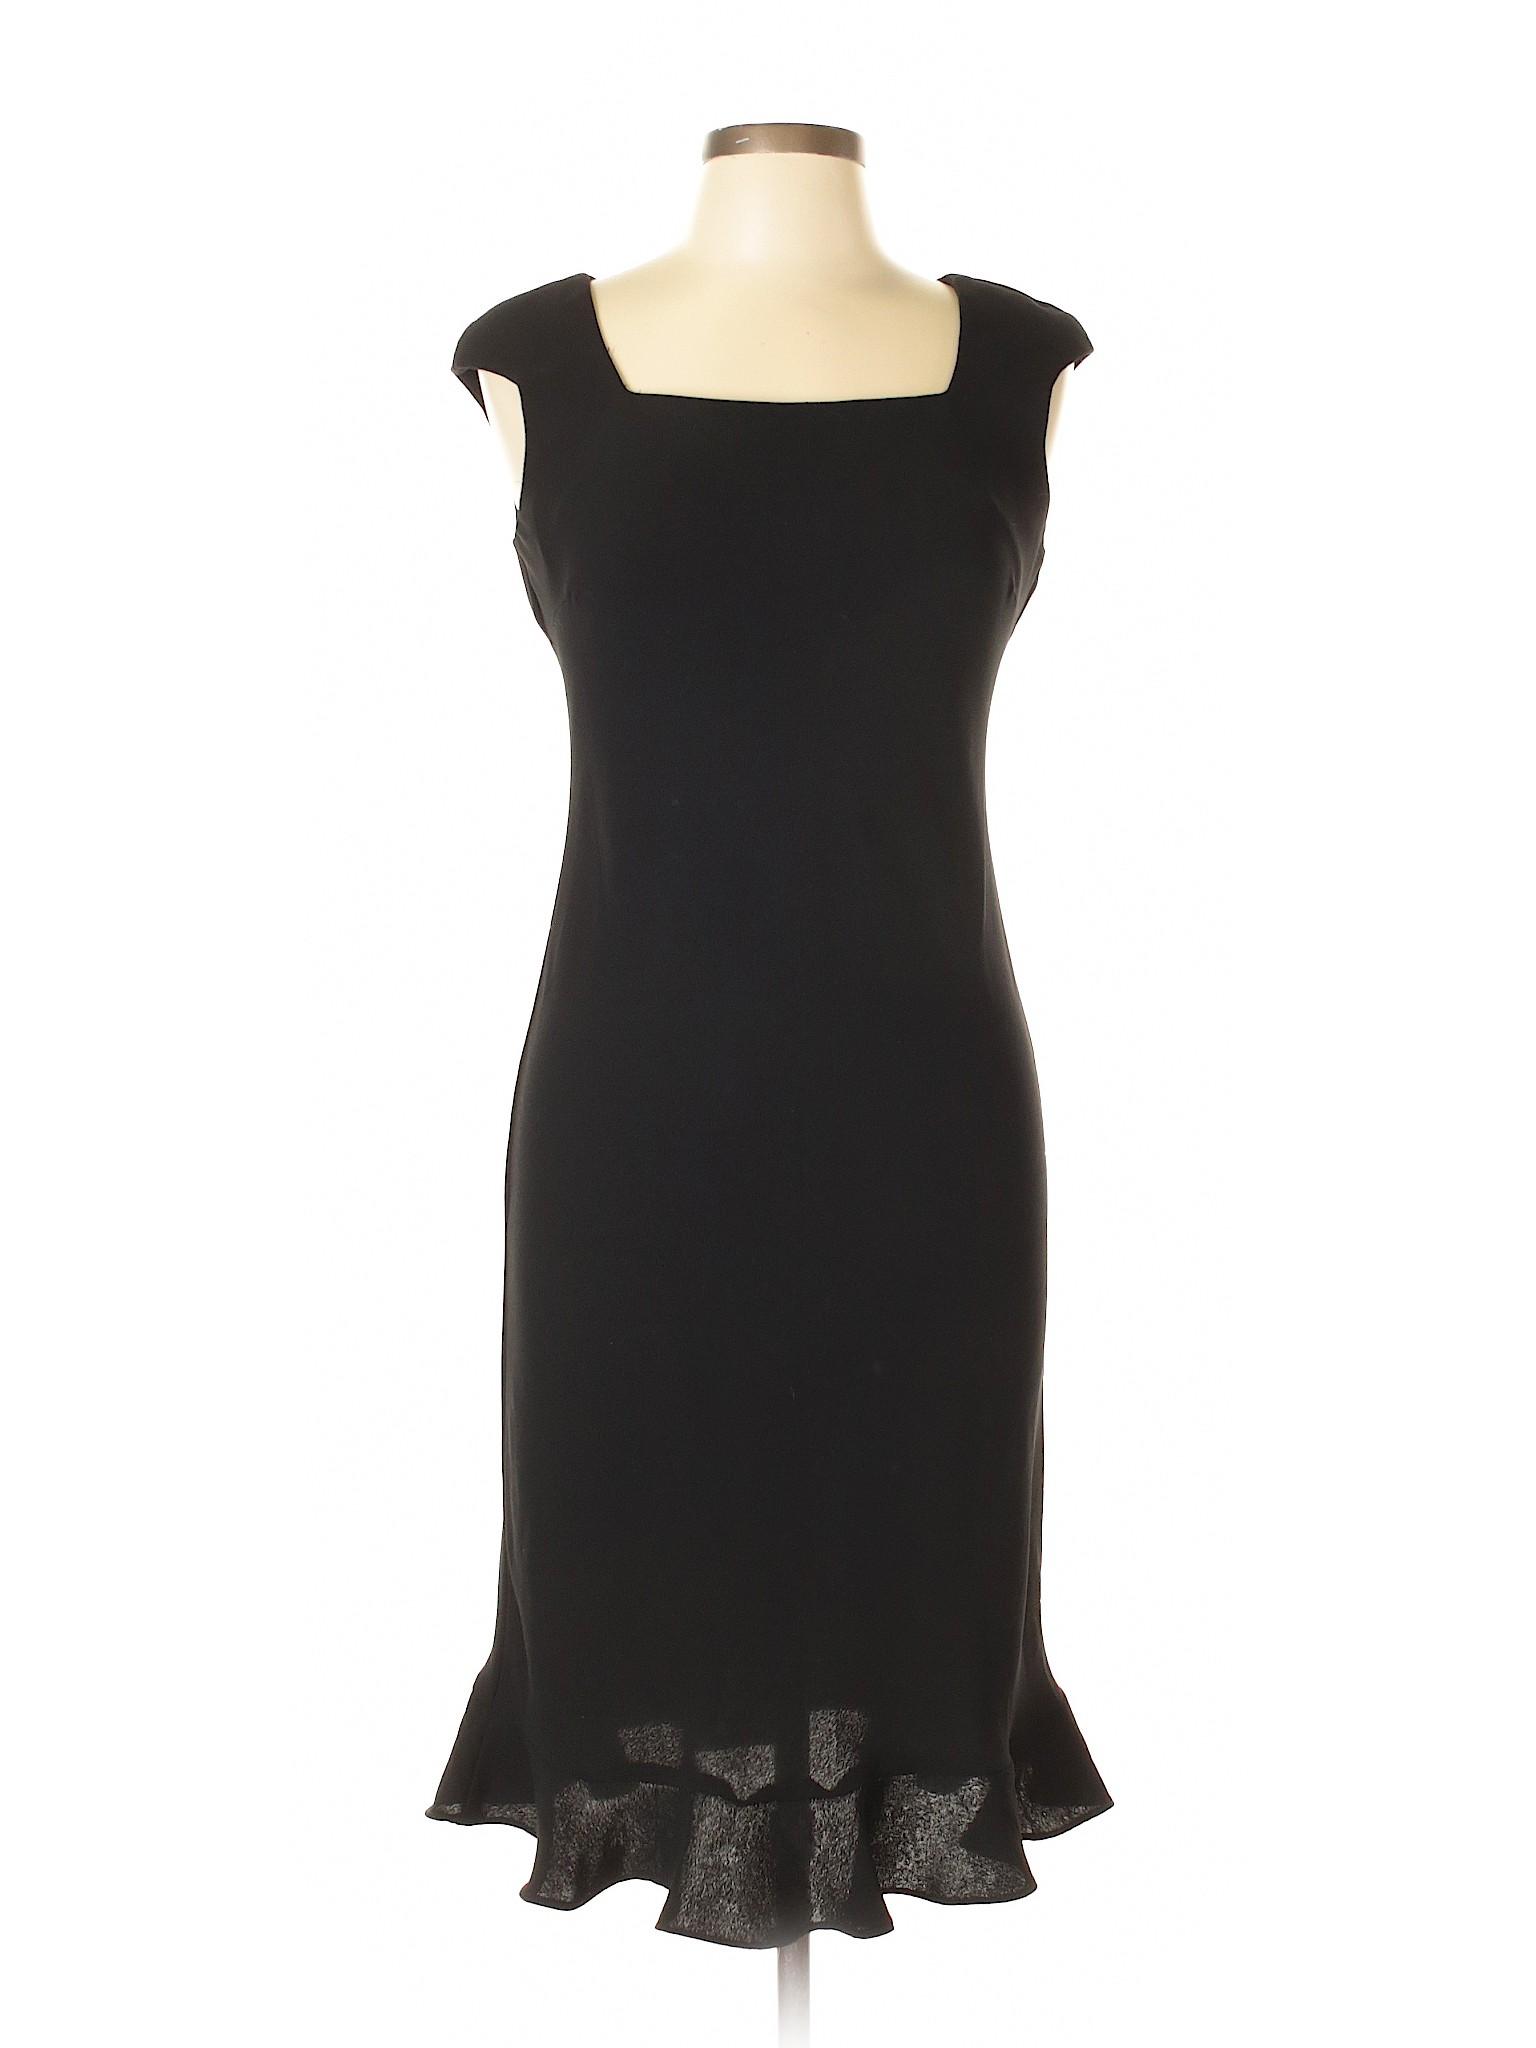 Casual Fashions L winter S Dress Boutique RqBtIwz